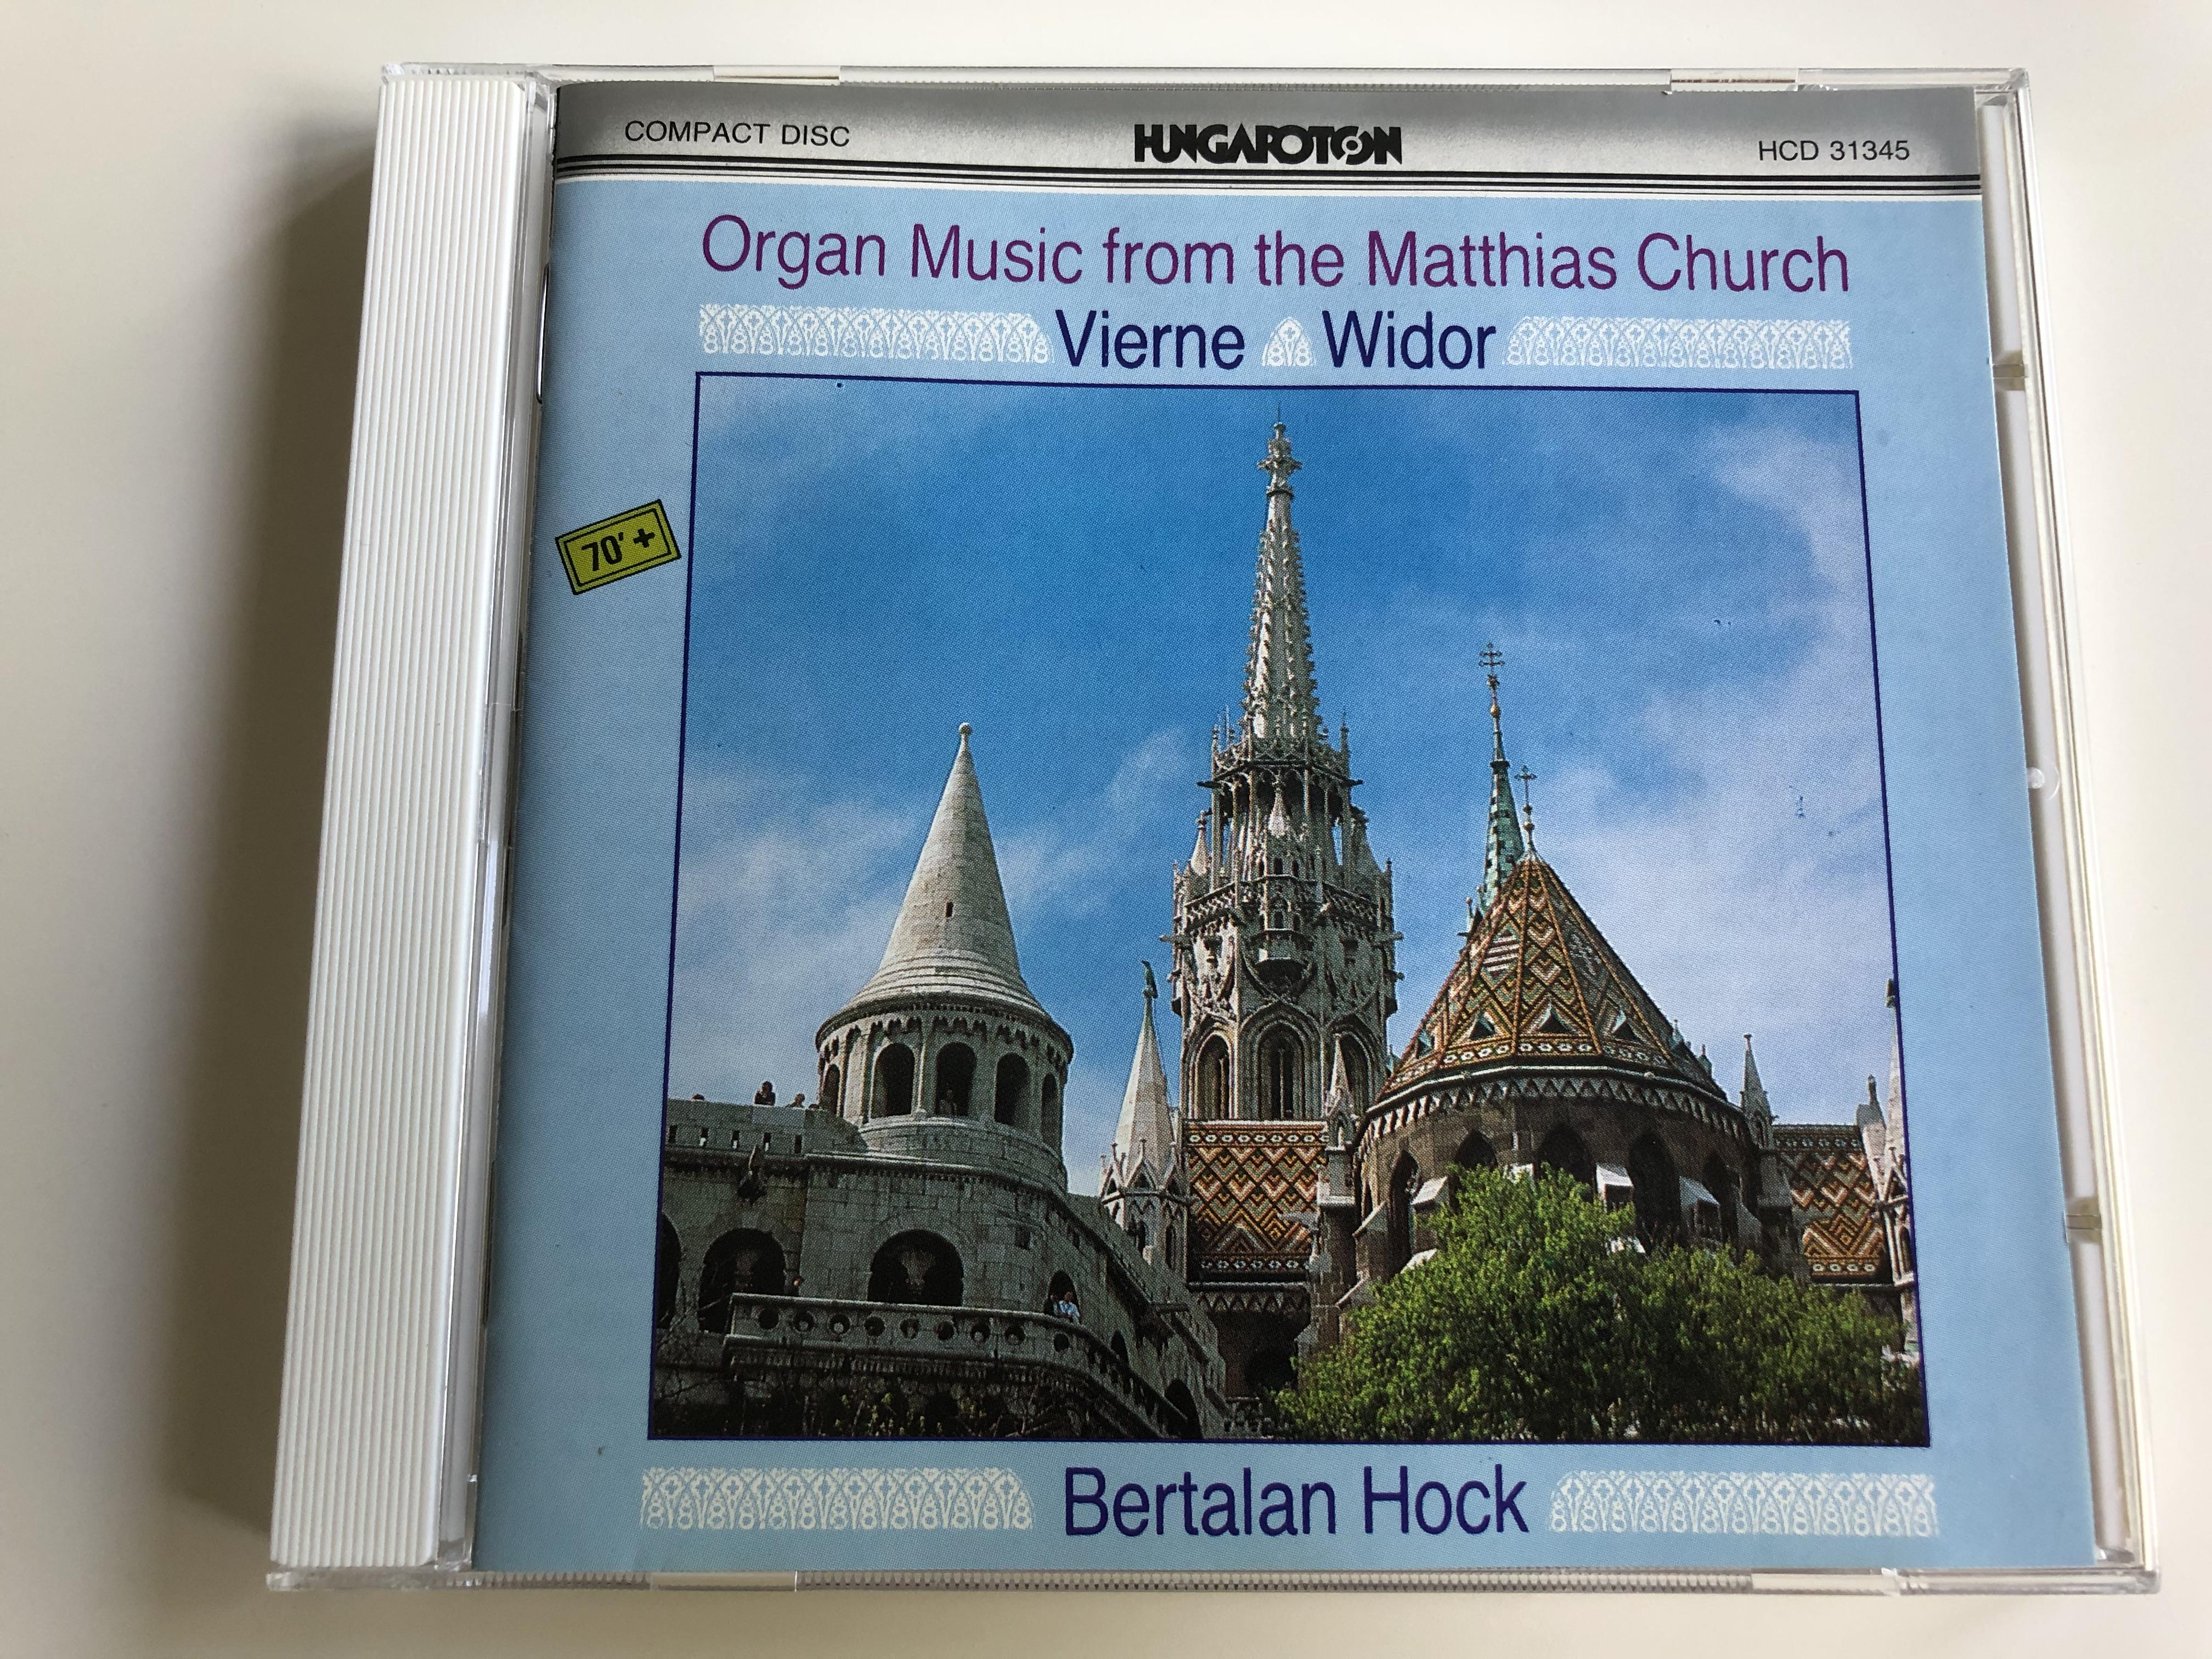 organ-music-from-the-matthias-church-louis-vierne-symphony-no.-1-charles-marie-widor-symphony-no.-6-bertalan-hock-audio-cd-1999-hungaroton-hcd-31345-1-.jpg